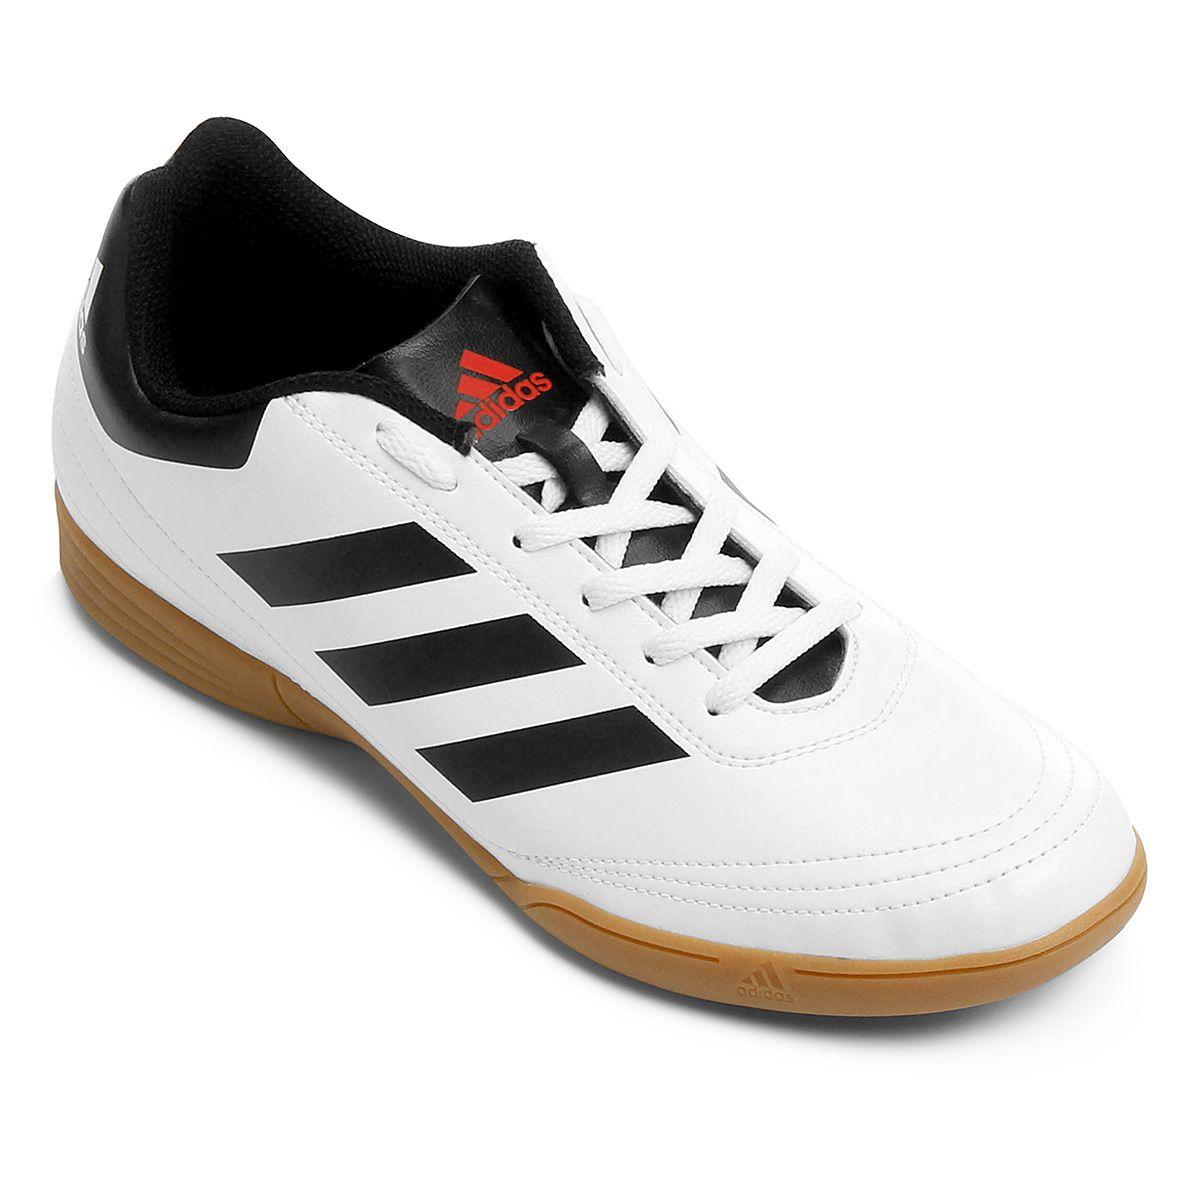 dc39ff791d9a6 Chuteira Futsal Adidas Goletto Vi In Infantil - Branco